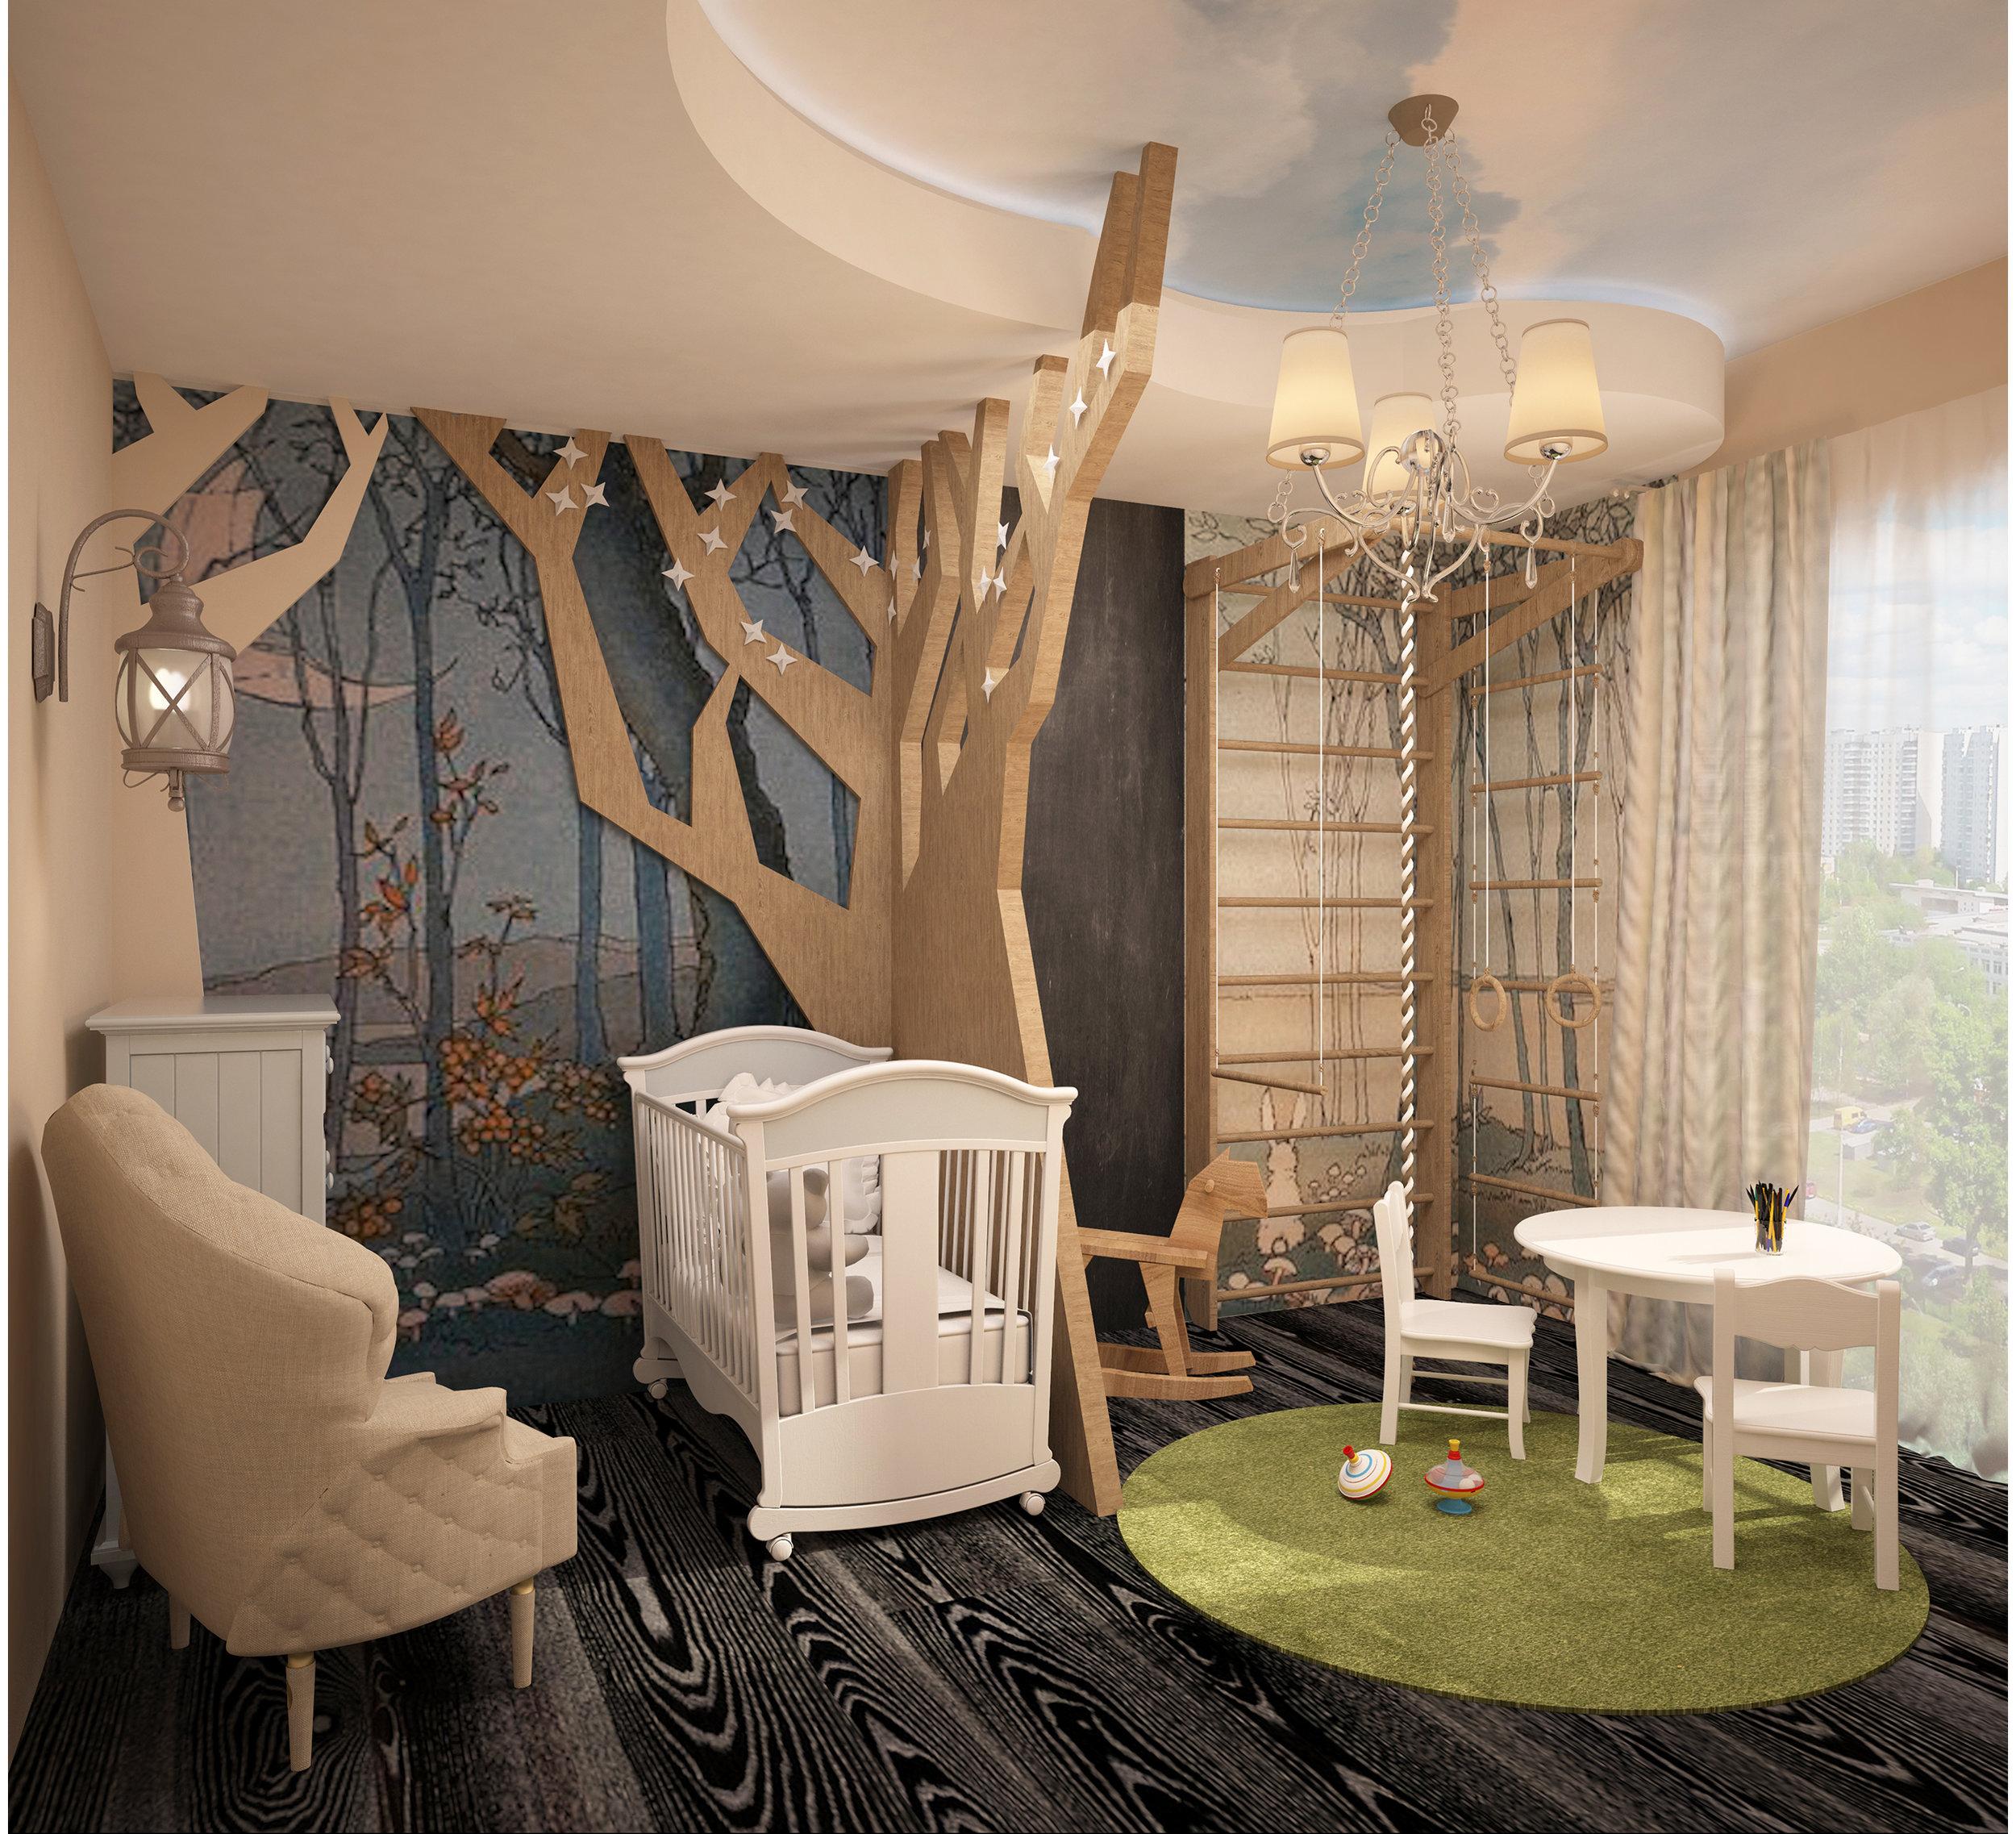 Copy of Nursery interior. Fairytale forest.